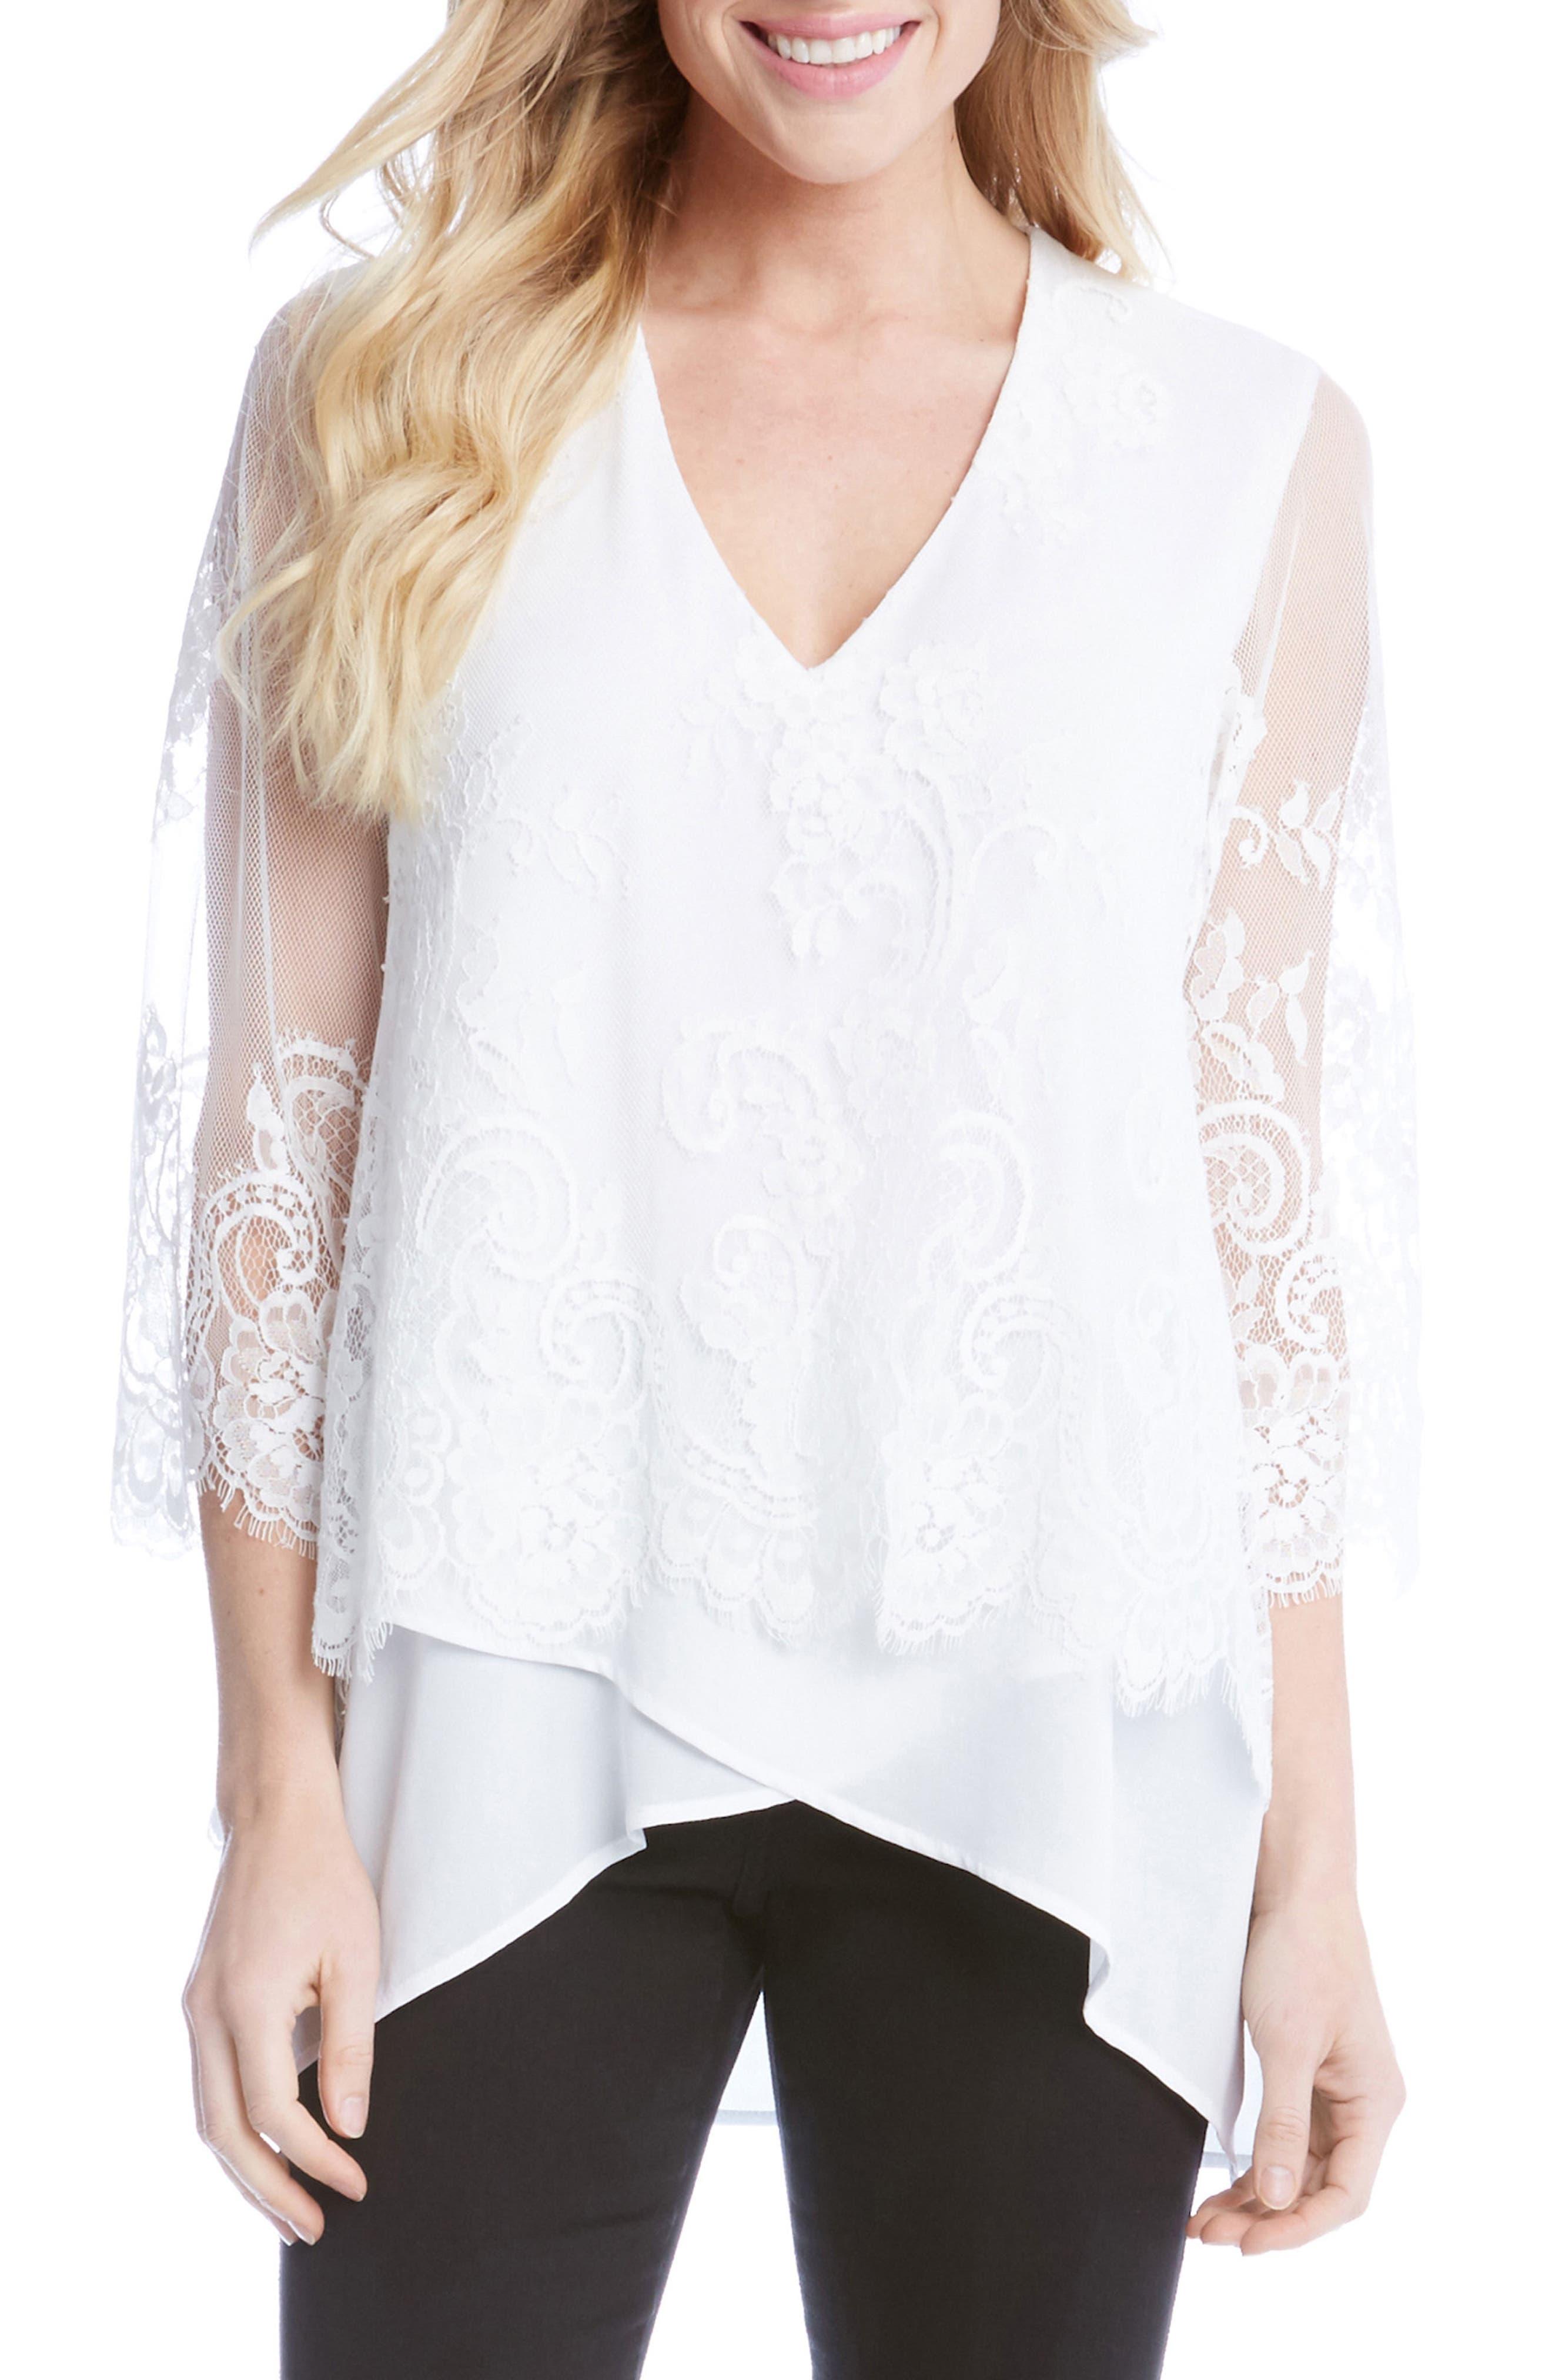 Main Image - Karen Kane Lace Overlay Asymmetrical Top